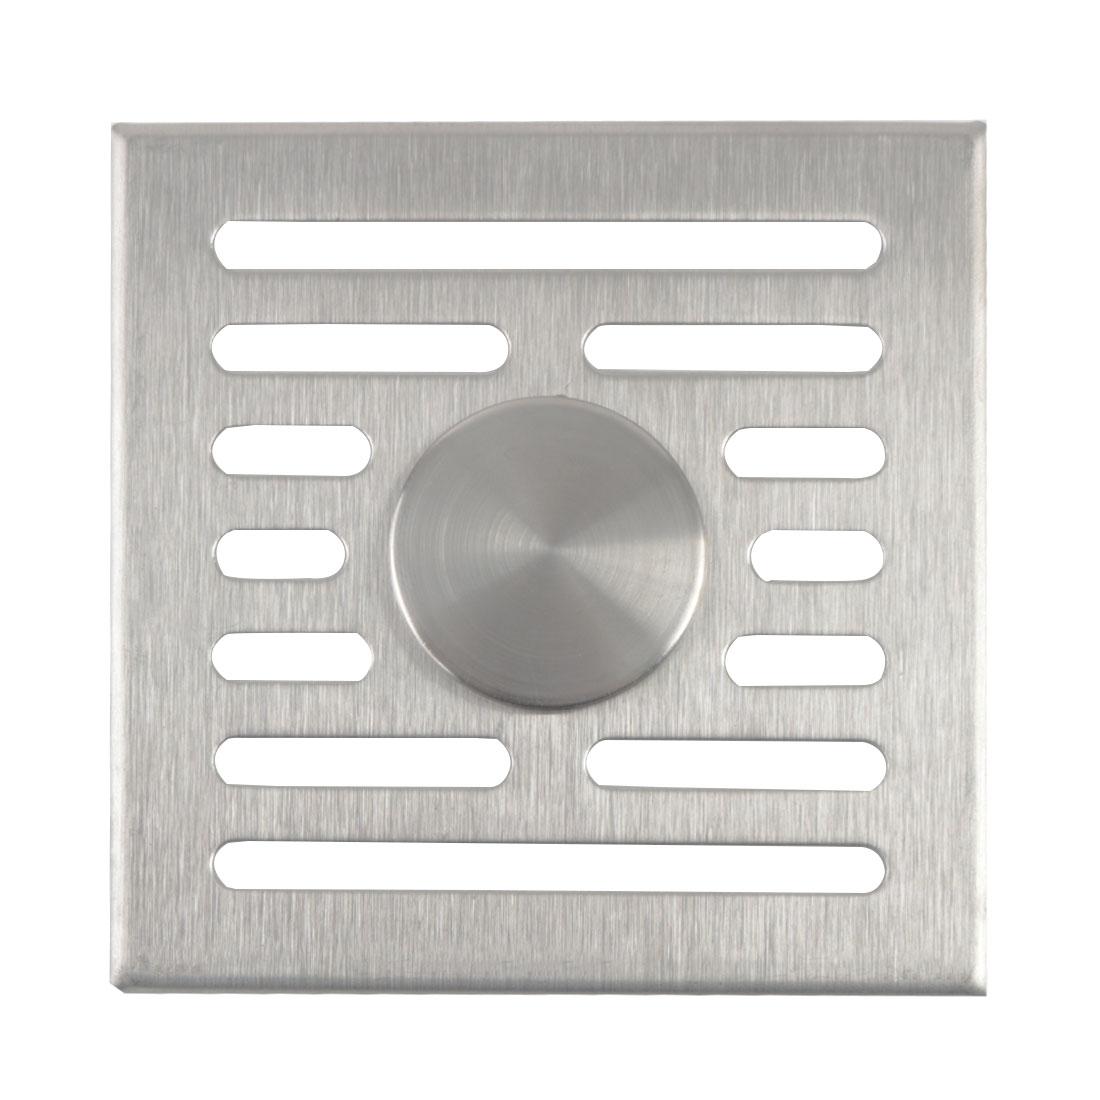 "Dual Use Floor Drain Cover Bathroom 3.7"" Square Strip Hole Sink Drain Strainer"